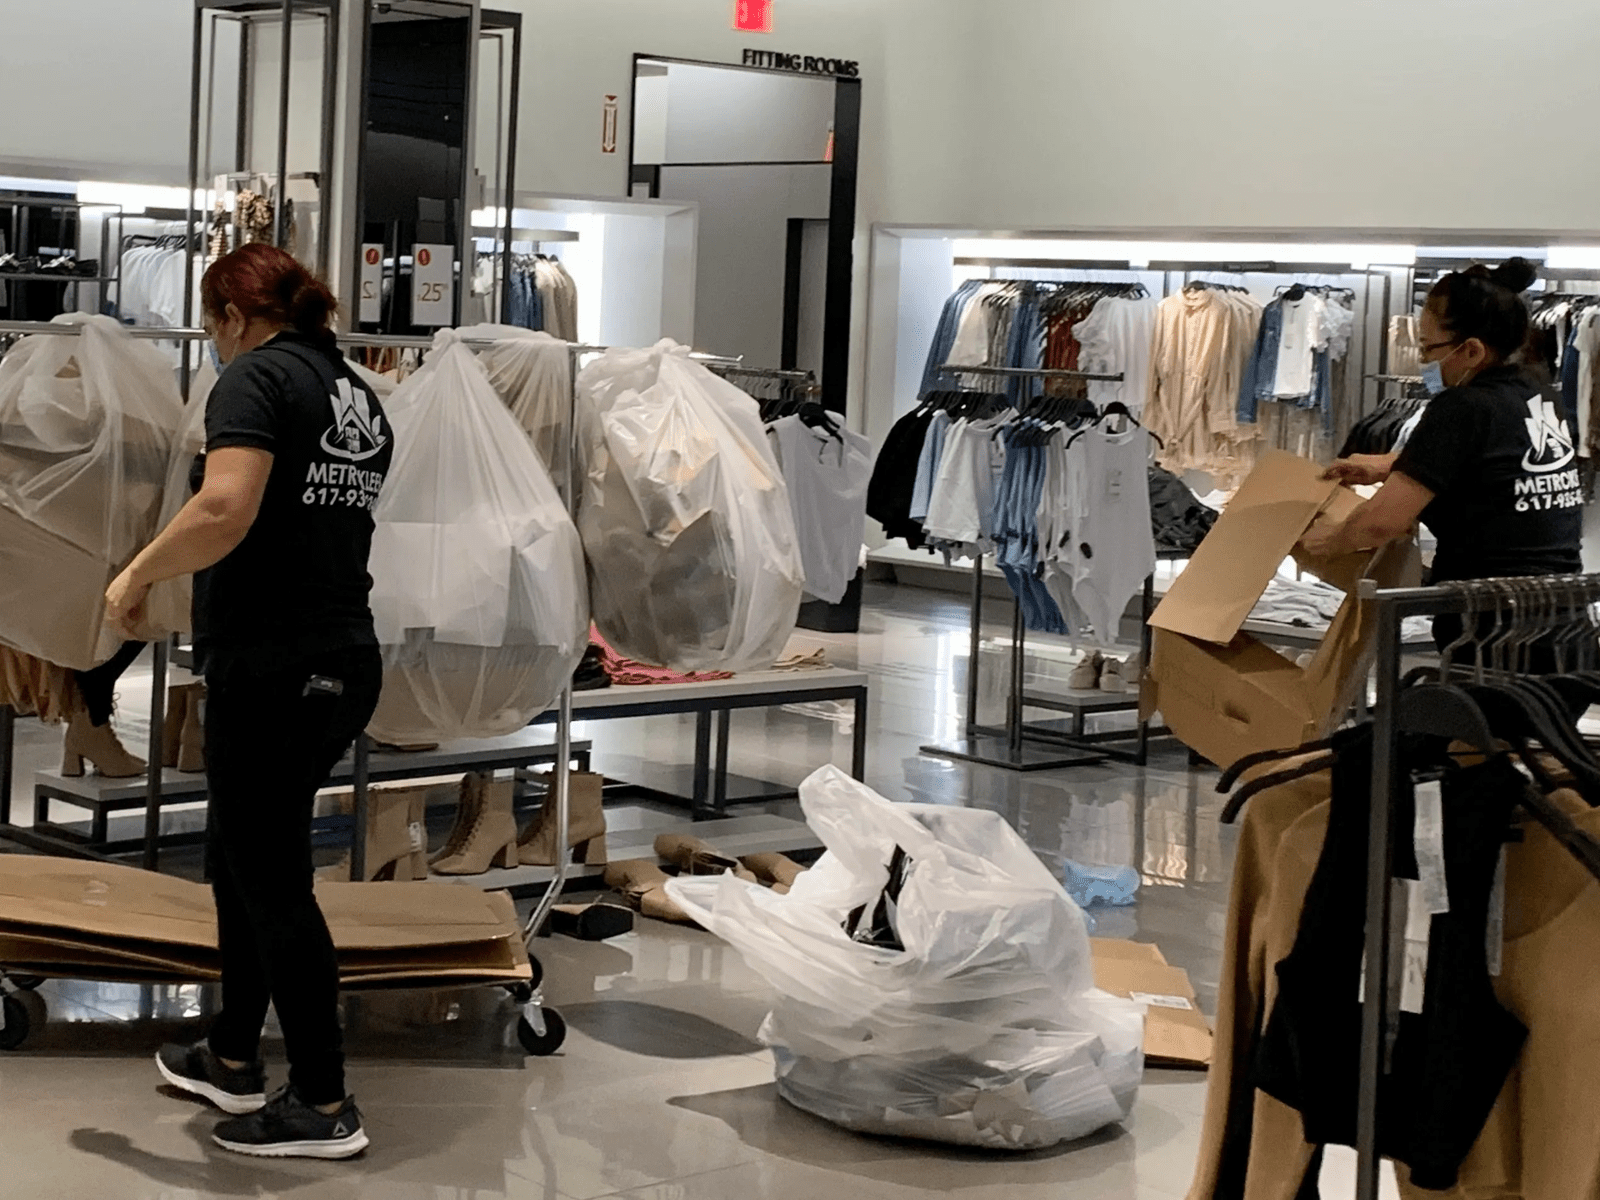 Zara Store Cleaning